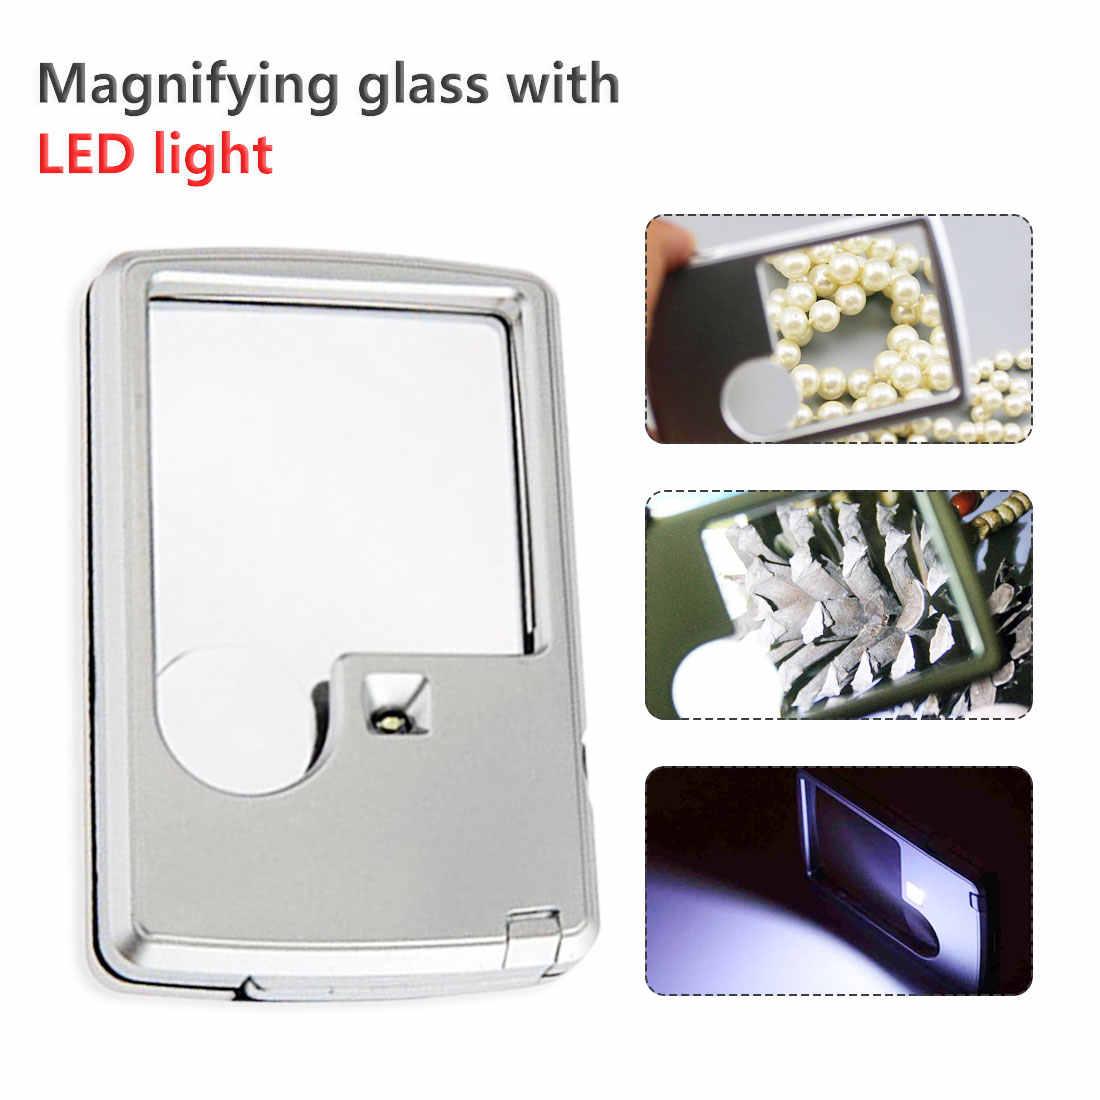 1PCS Kreditkarte 88*57*10mm 2 Objektiv Lupe Ultra-dünne Tragbare Platz Mikroskop Mit LED Licht Leder Fall Für Lesen Glas